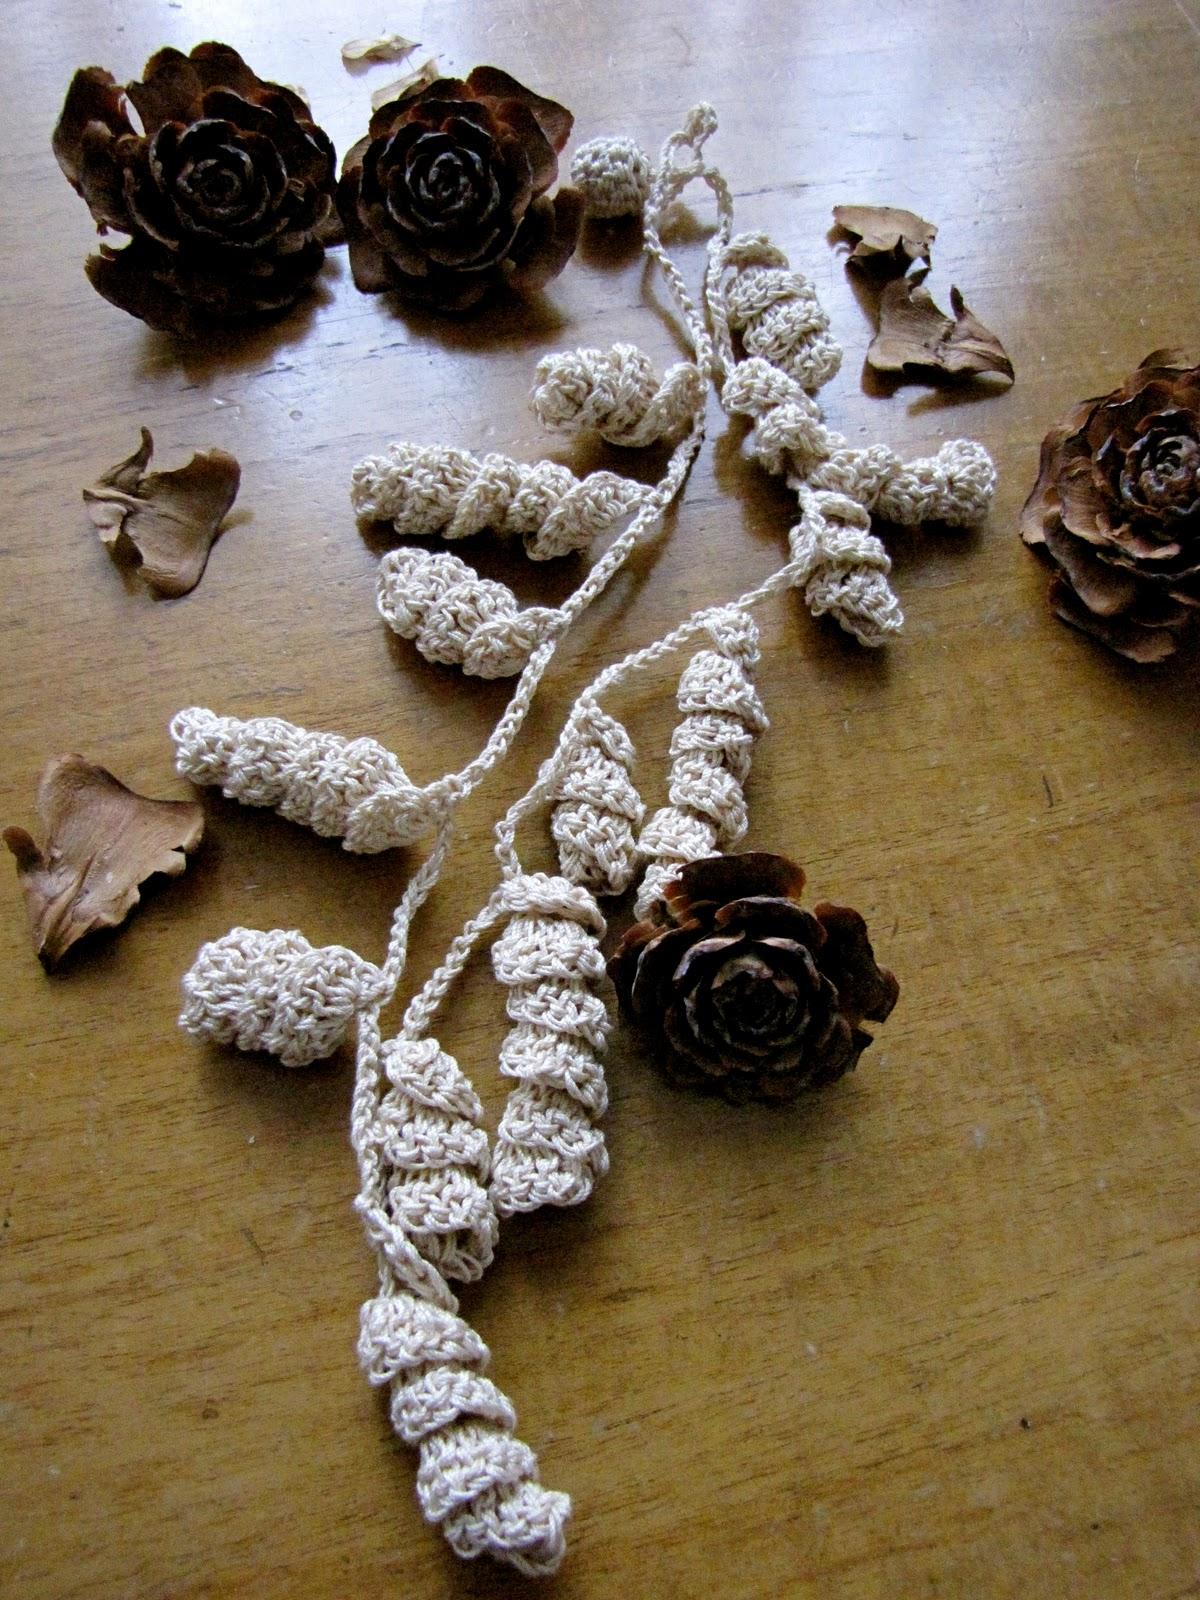 Irish Filigree Crochet Necklace Free Pattern : Little Treasures: Irish Lace Crochet Necklace